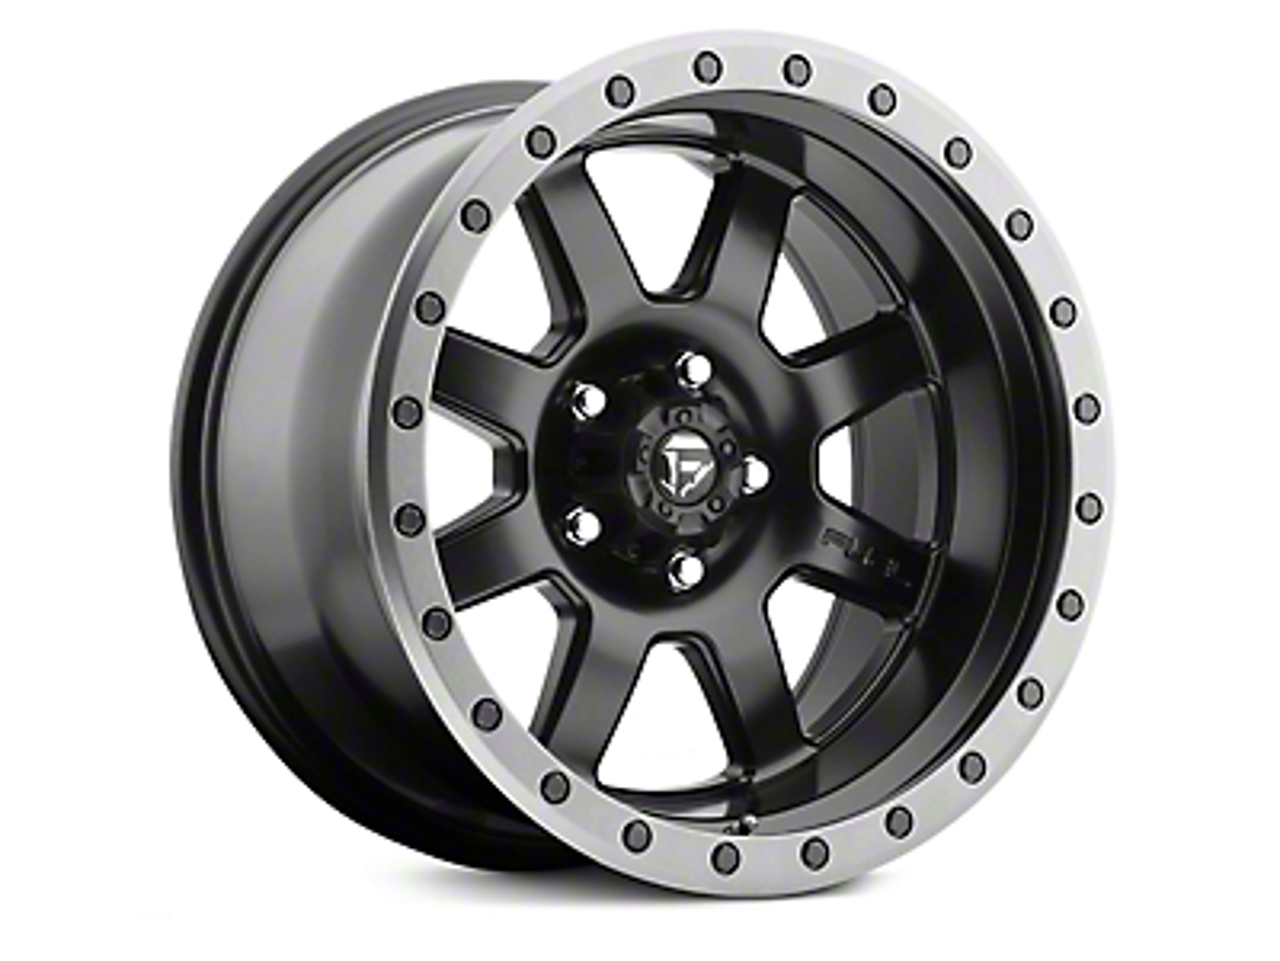 Fuel Wheels Trophy Matte Black w/ Anthracite Ring 6-Lug Wheel - 20x9 (99-18 Silverado 1500)